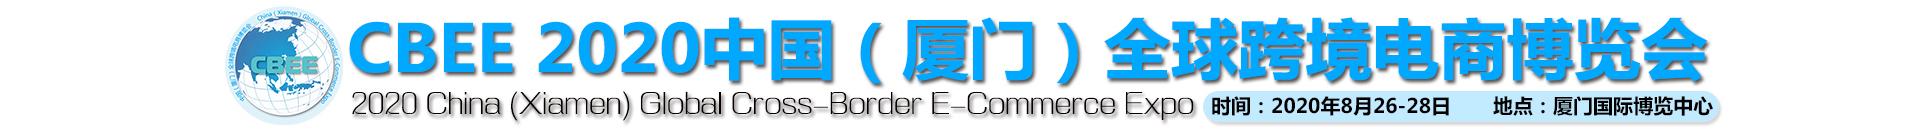 CBEE2020中国(厦门)全球跨境电商博览会